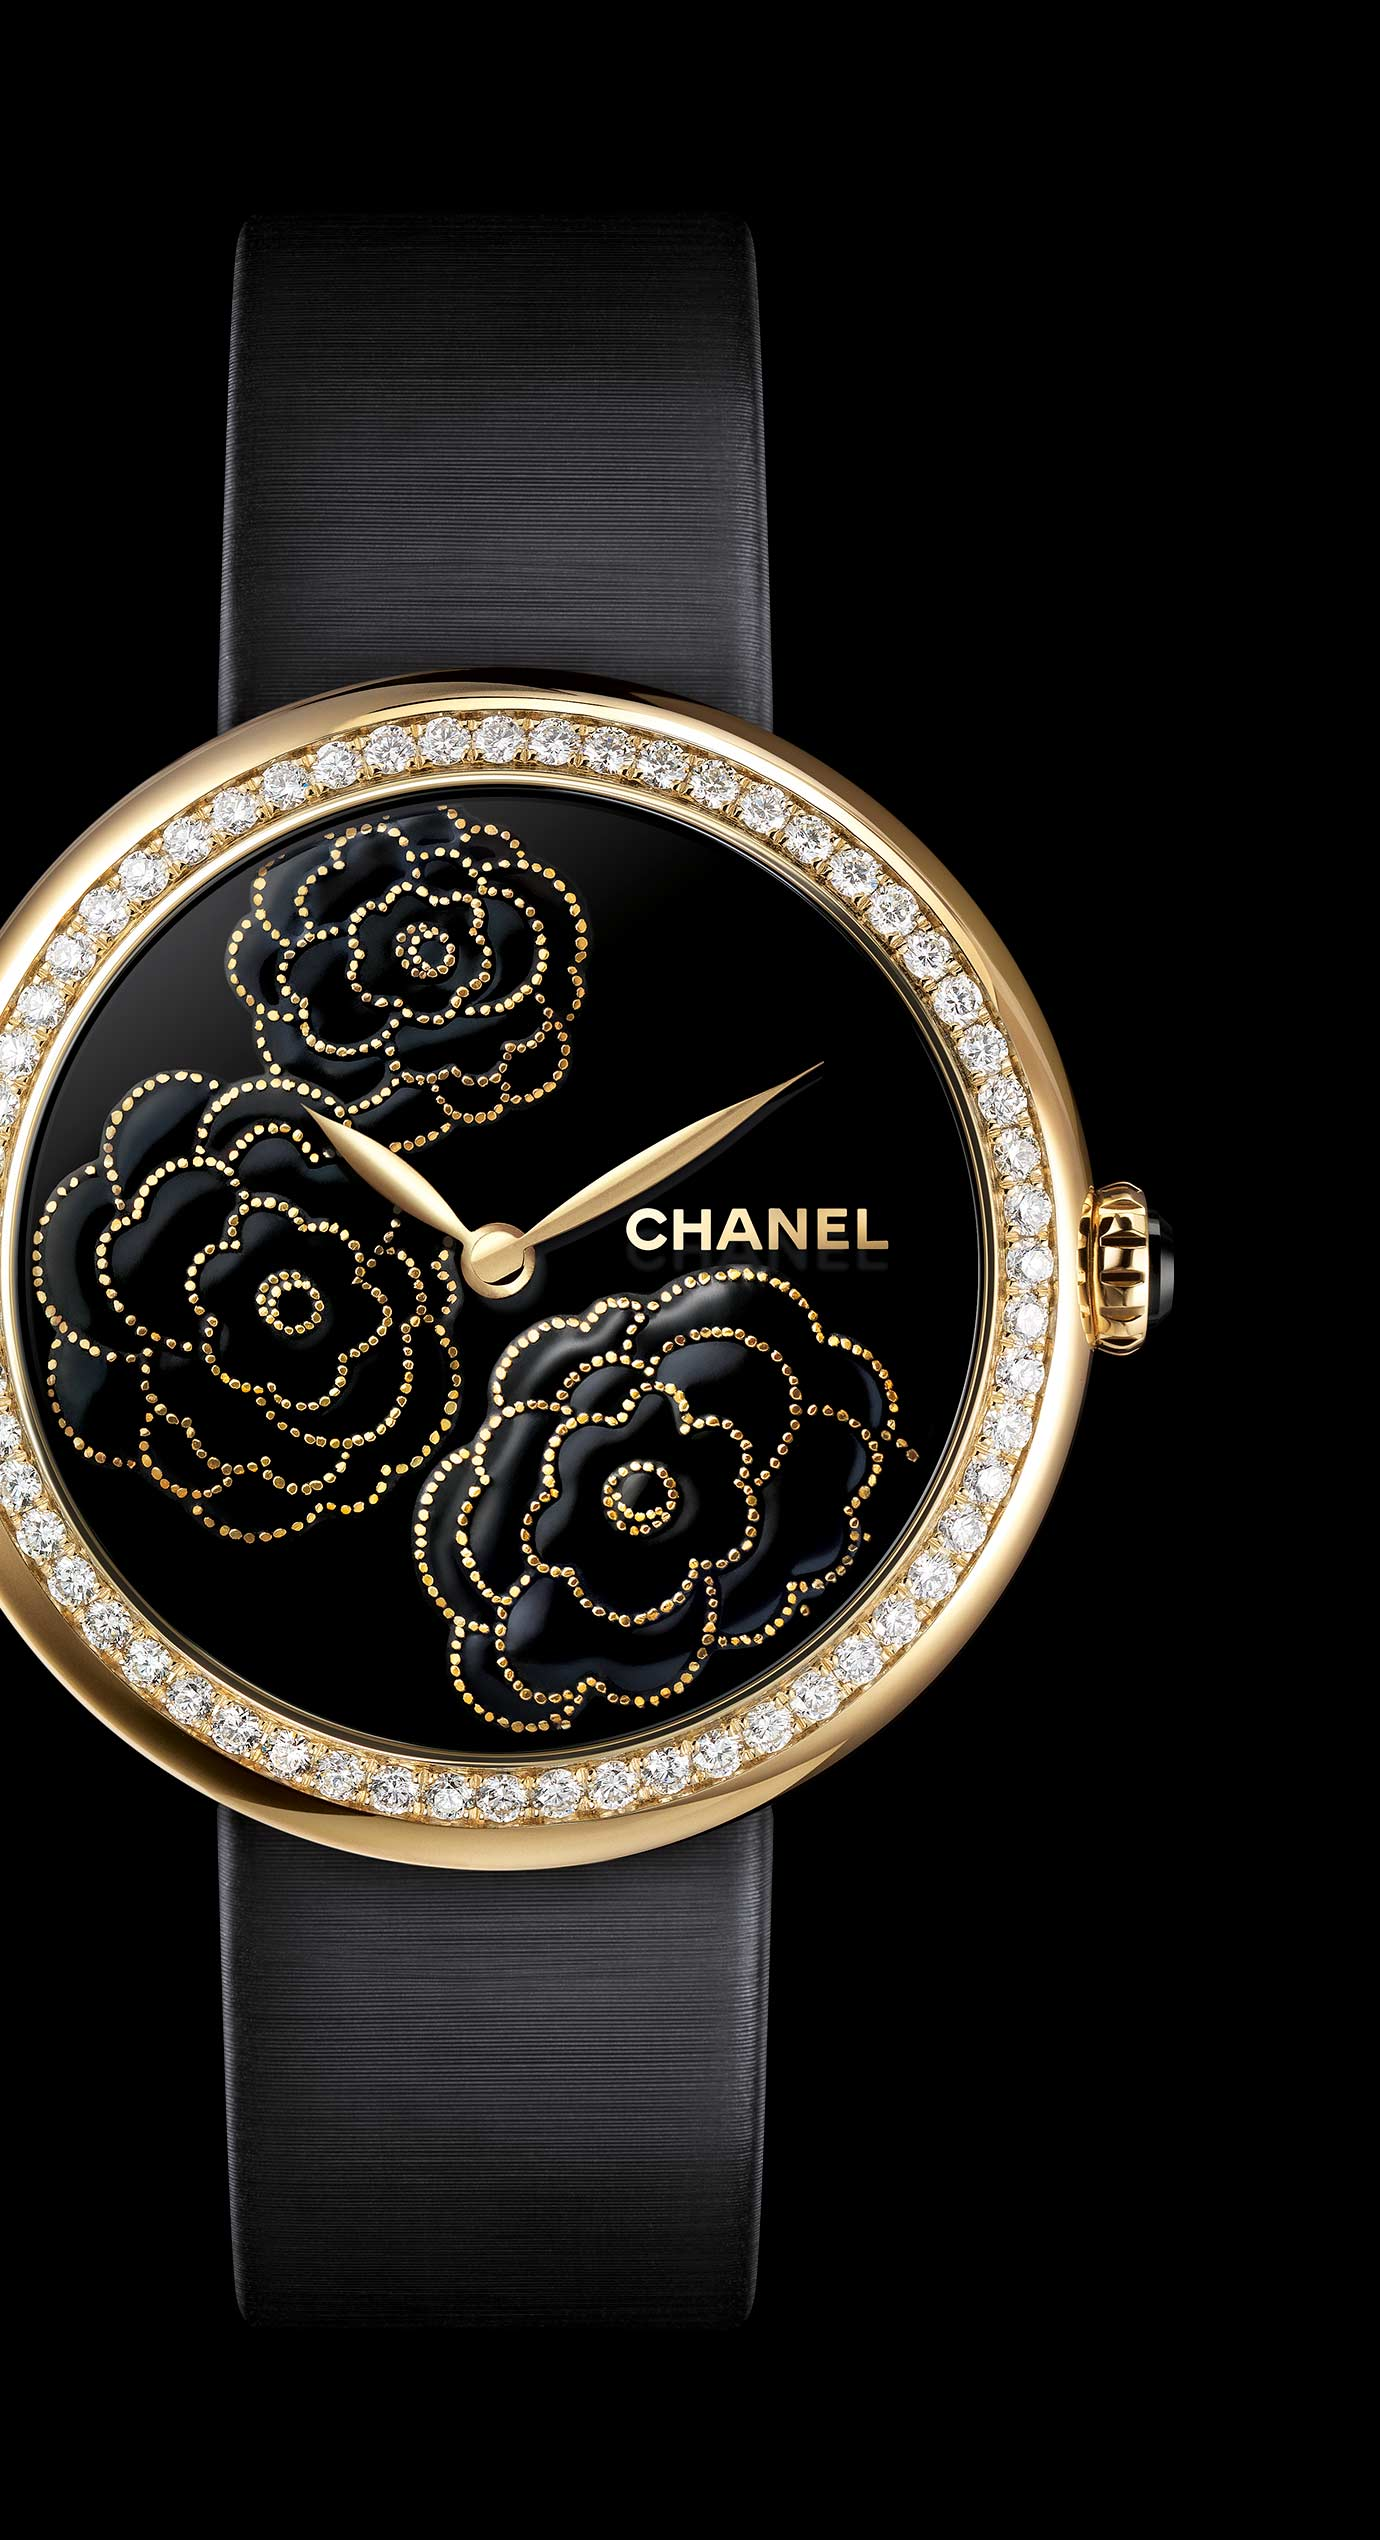 Reloj Mademoiselle Privé Camelias en oro amarillo, esfera lacada negra mediante la técnica del «maki-e» - Vista ampliada